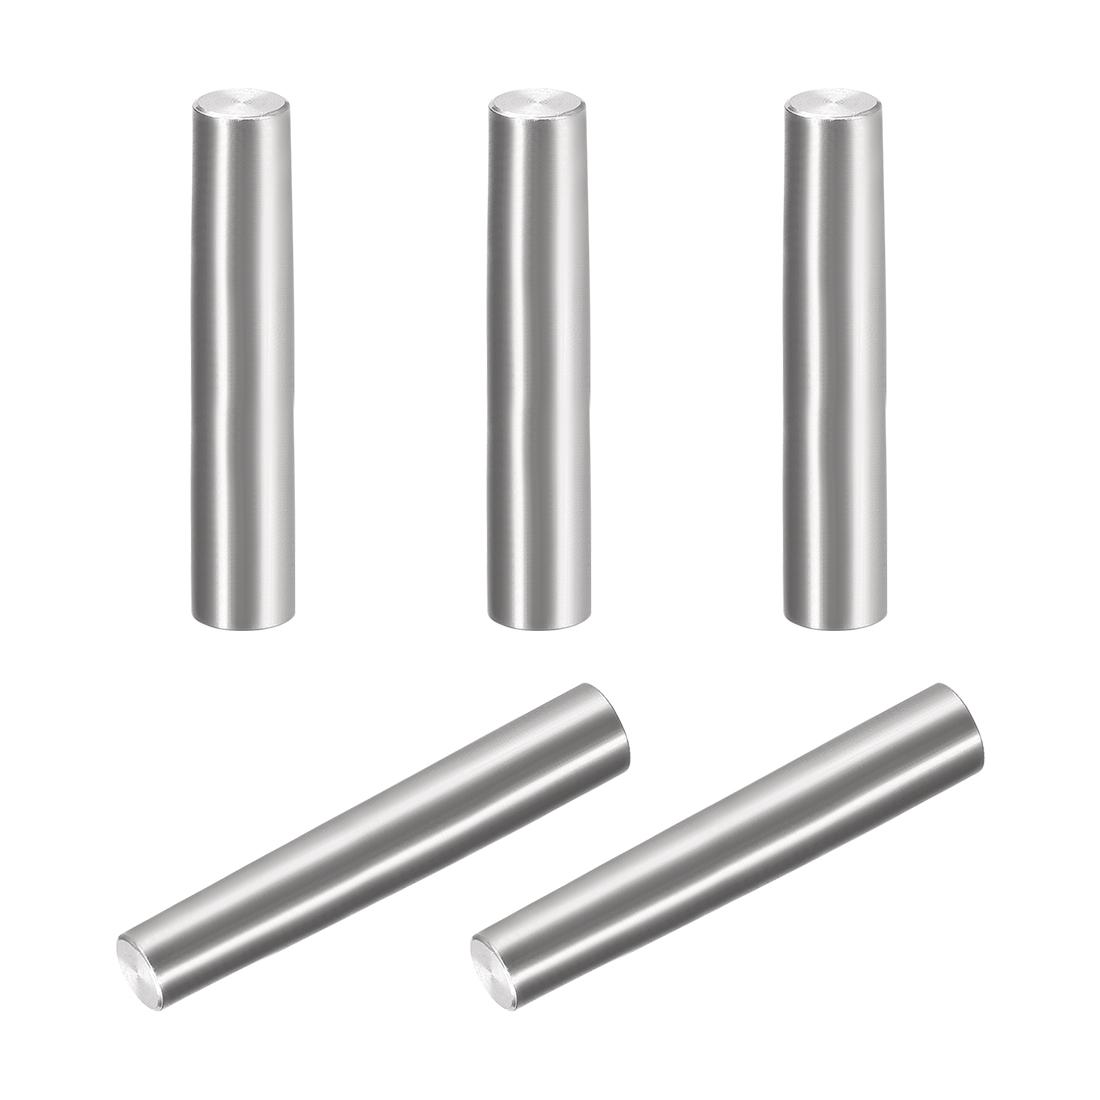 4Pcs 8mm x 50mm 1:50 Taper Pin 304 Stainless Steel Shelf Support Pin Fasten